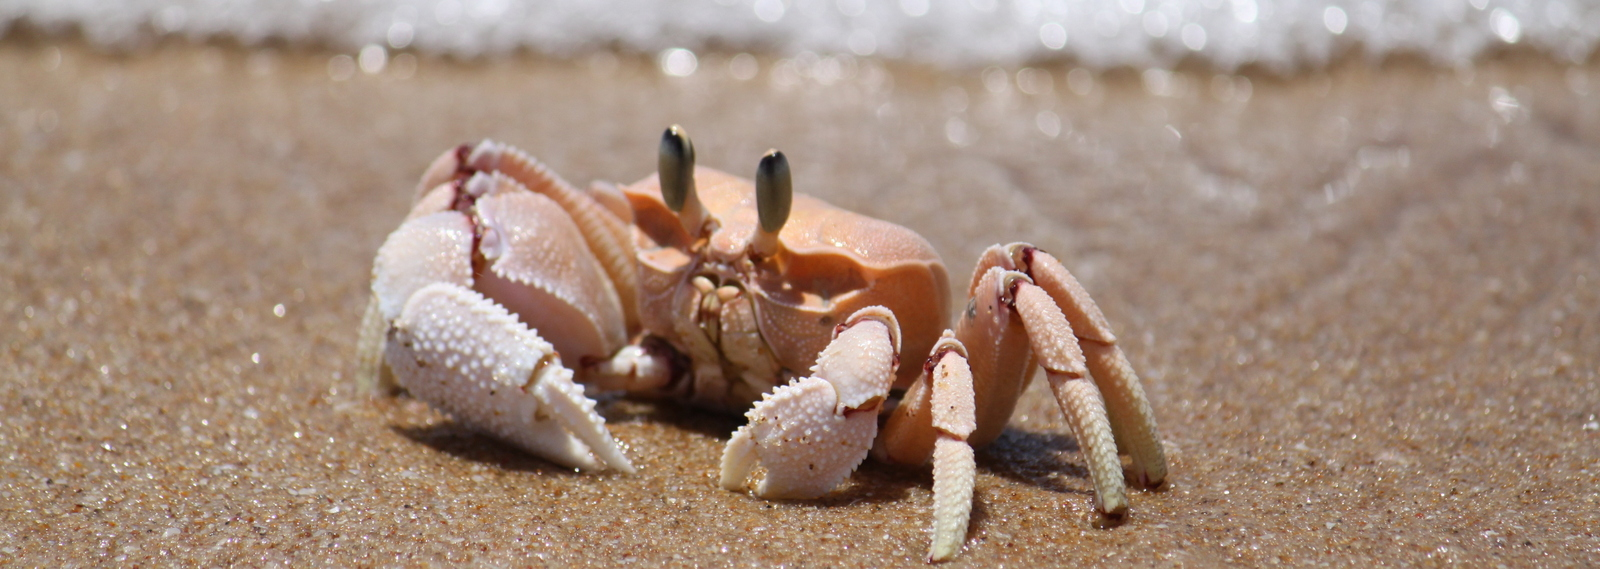 Crab, Tofu Beach, Mozambique